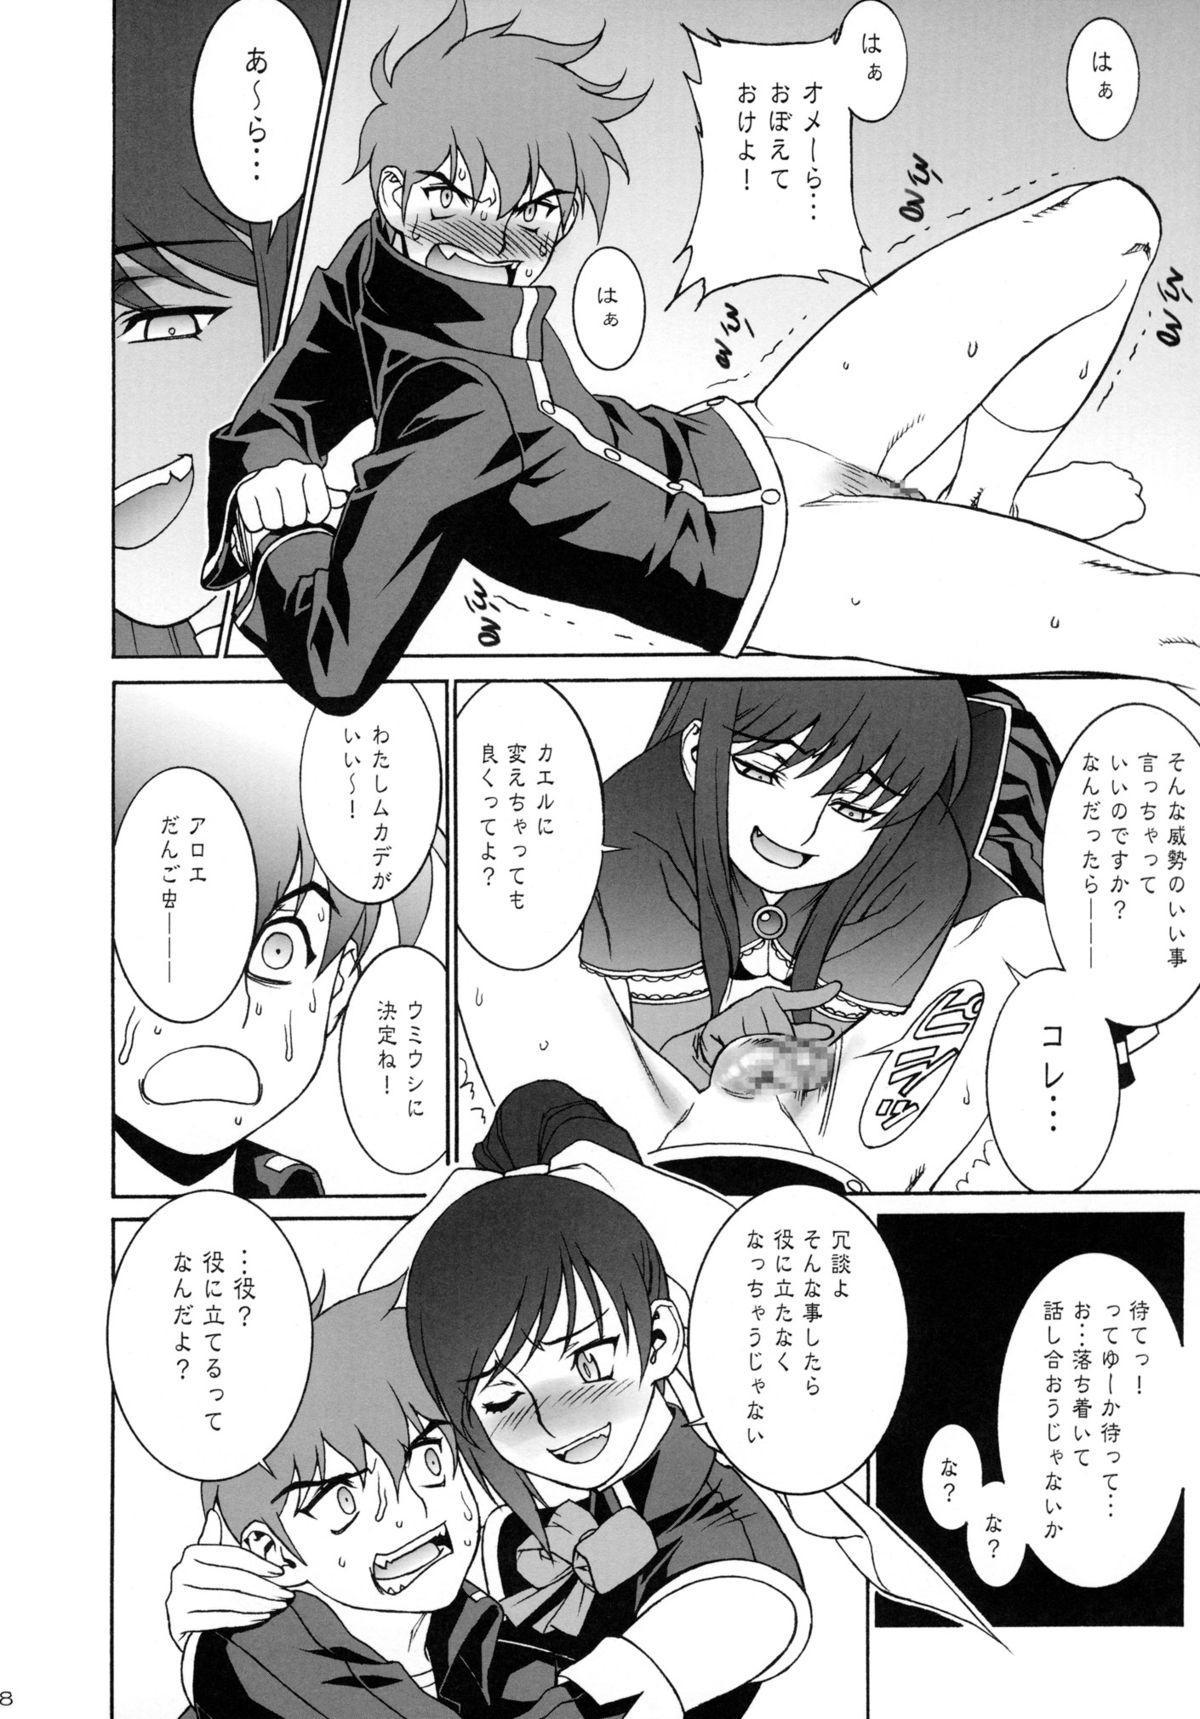 Momoiro! Mahou Gakuin 6